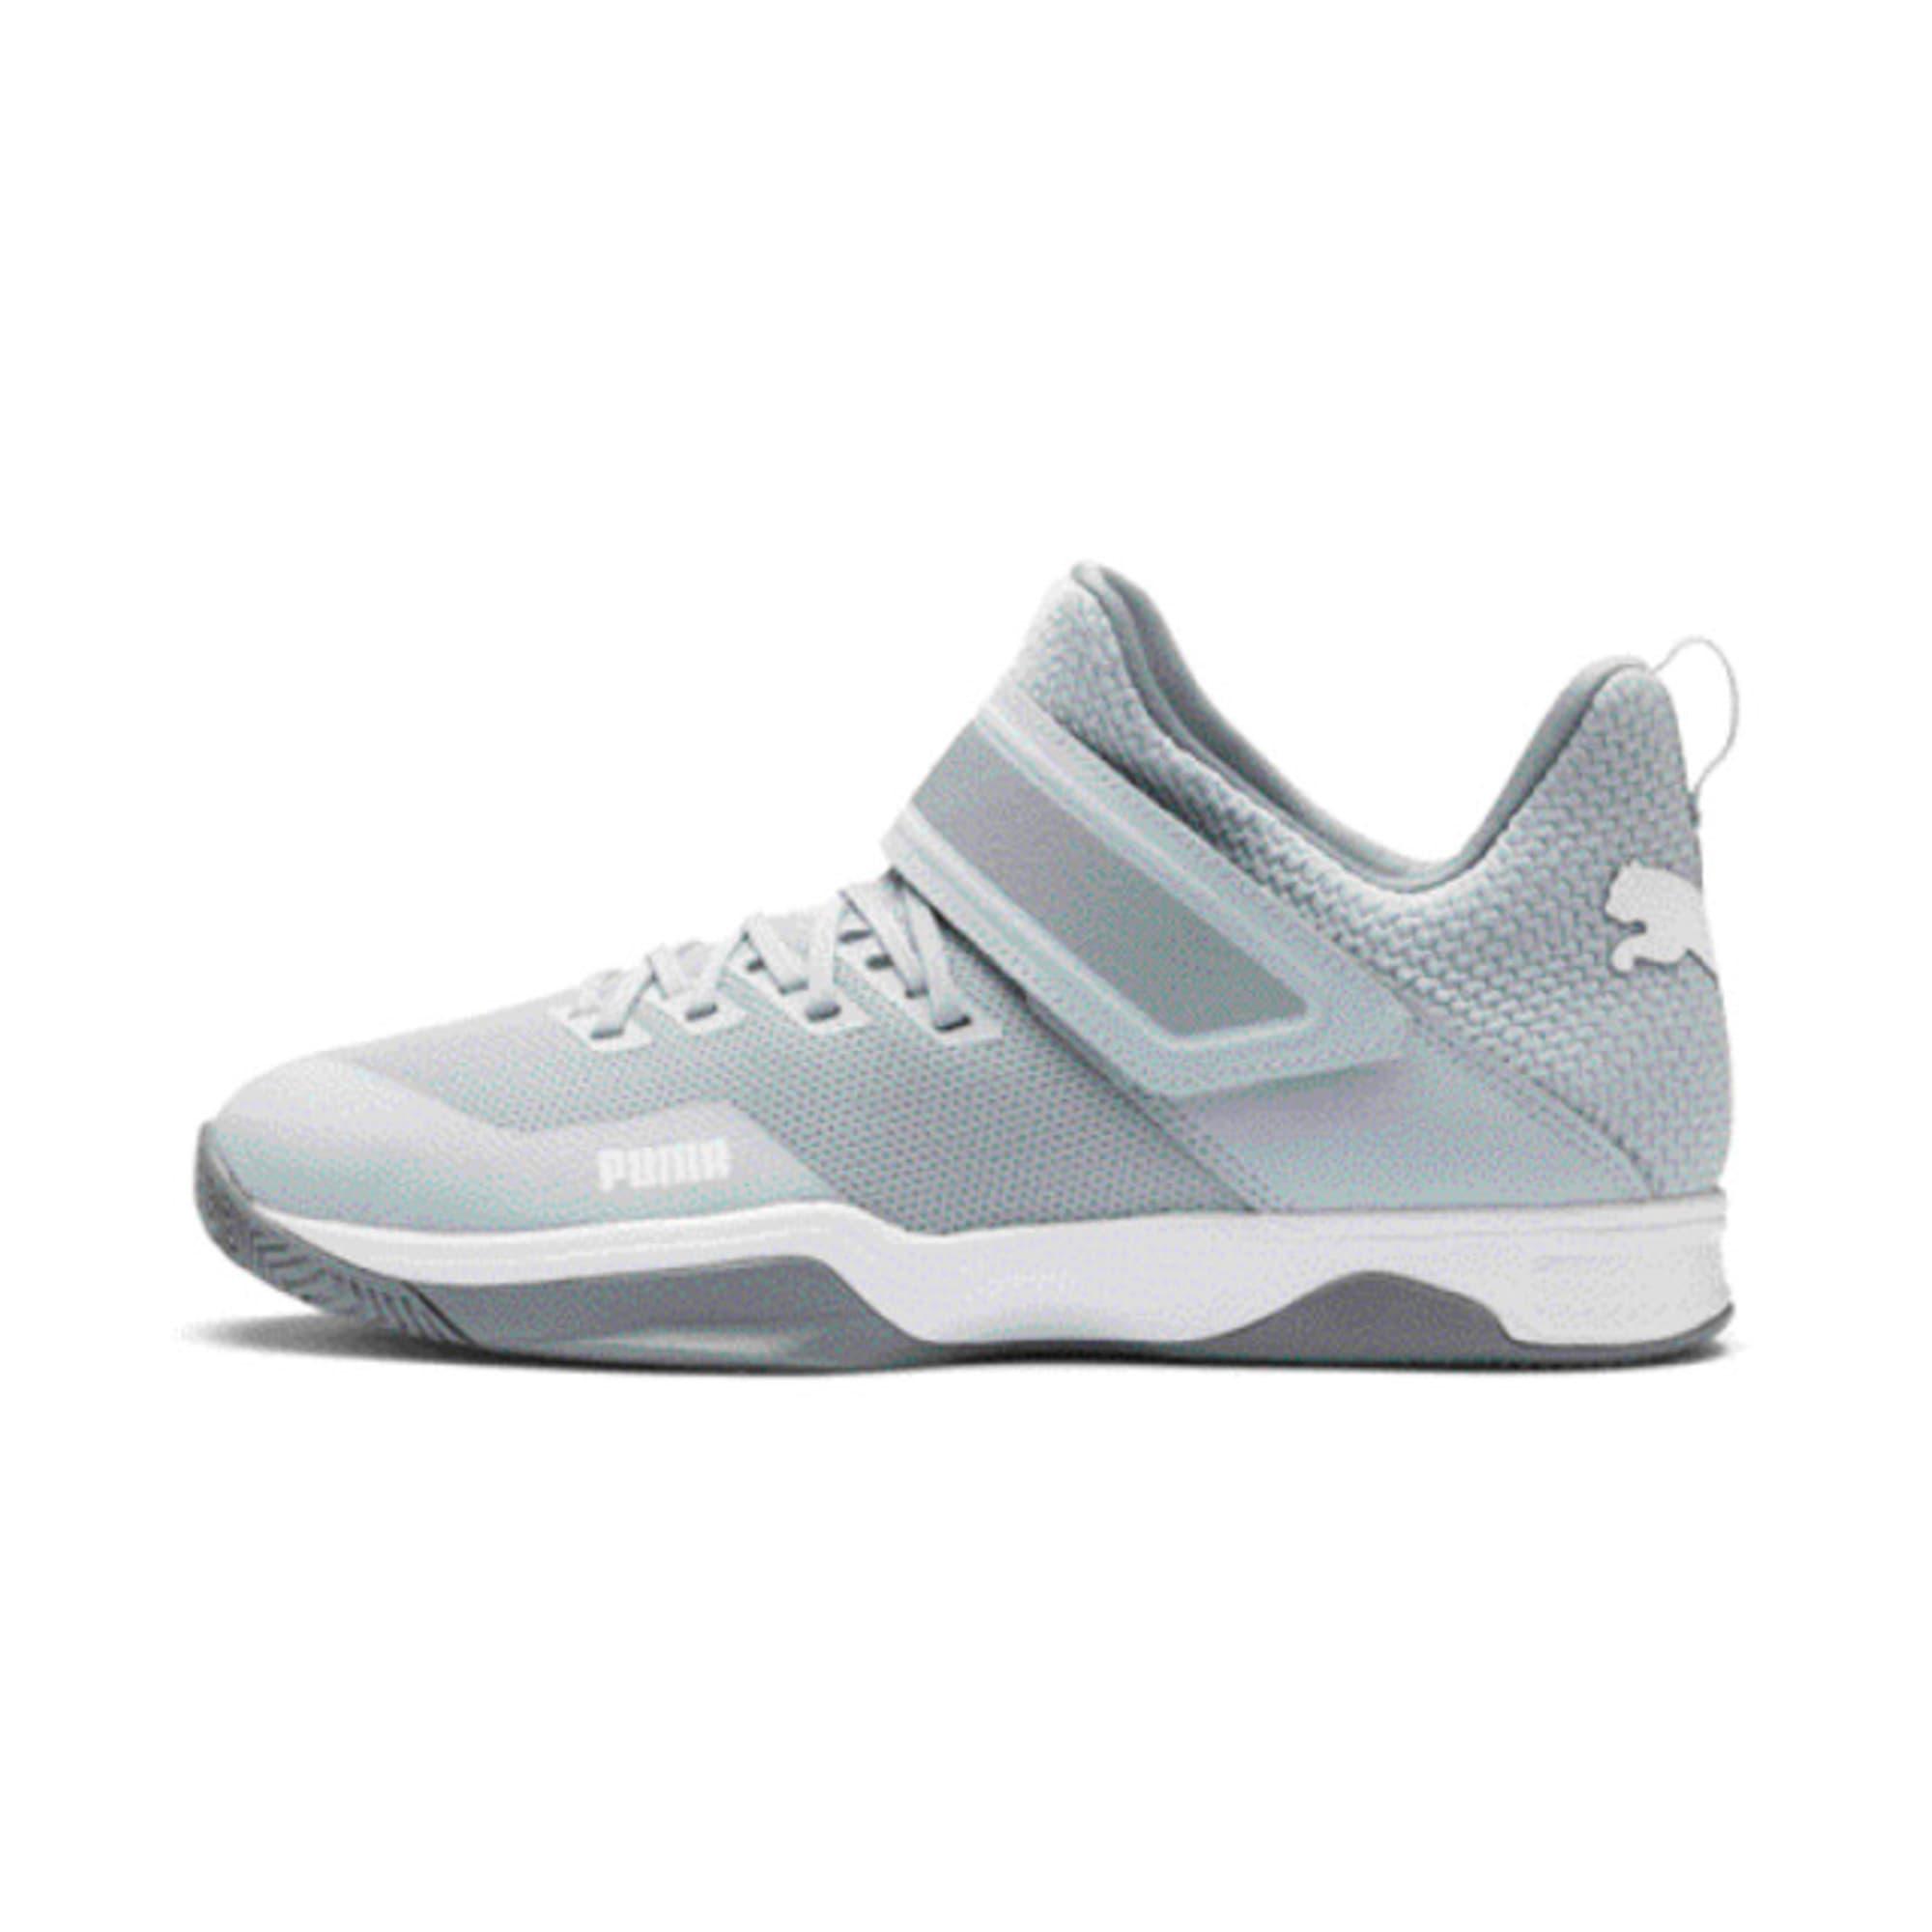 Thumbnail 1 of Rise XT3 Handball Shoes, Grey Dawn-White-Tradewinds, medium-IND